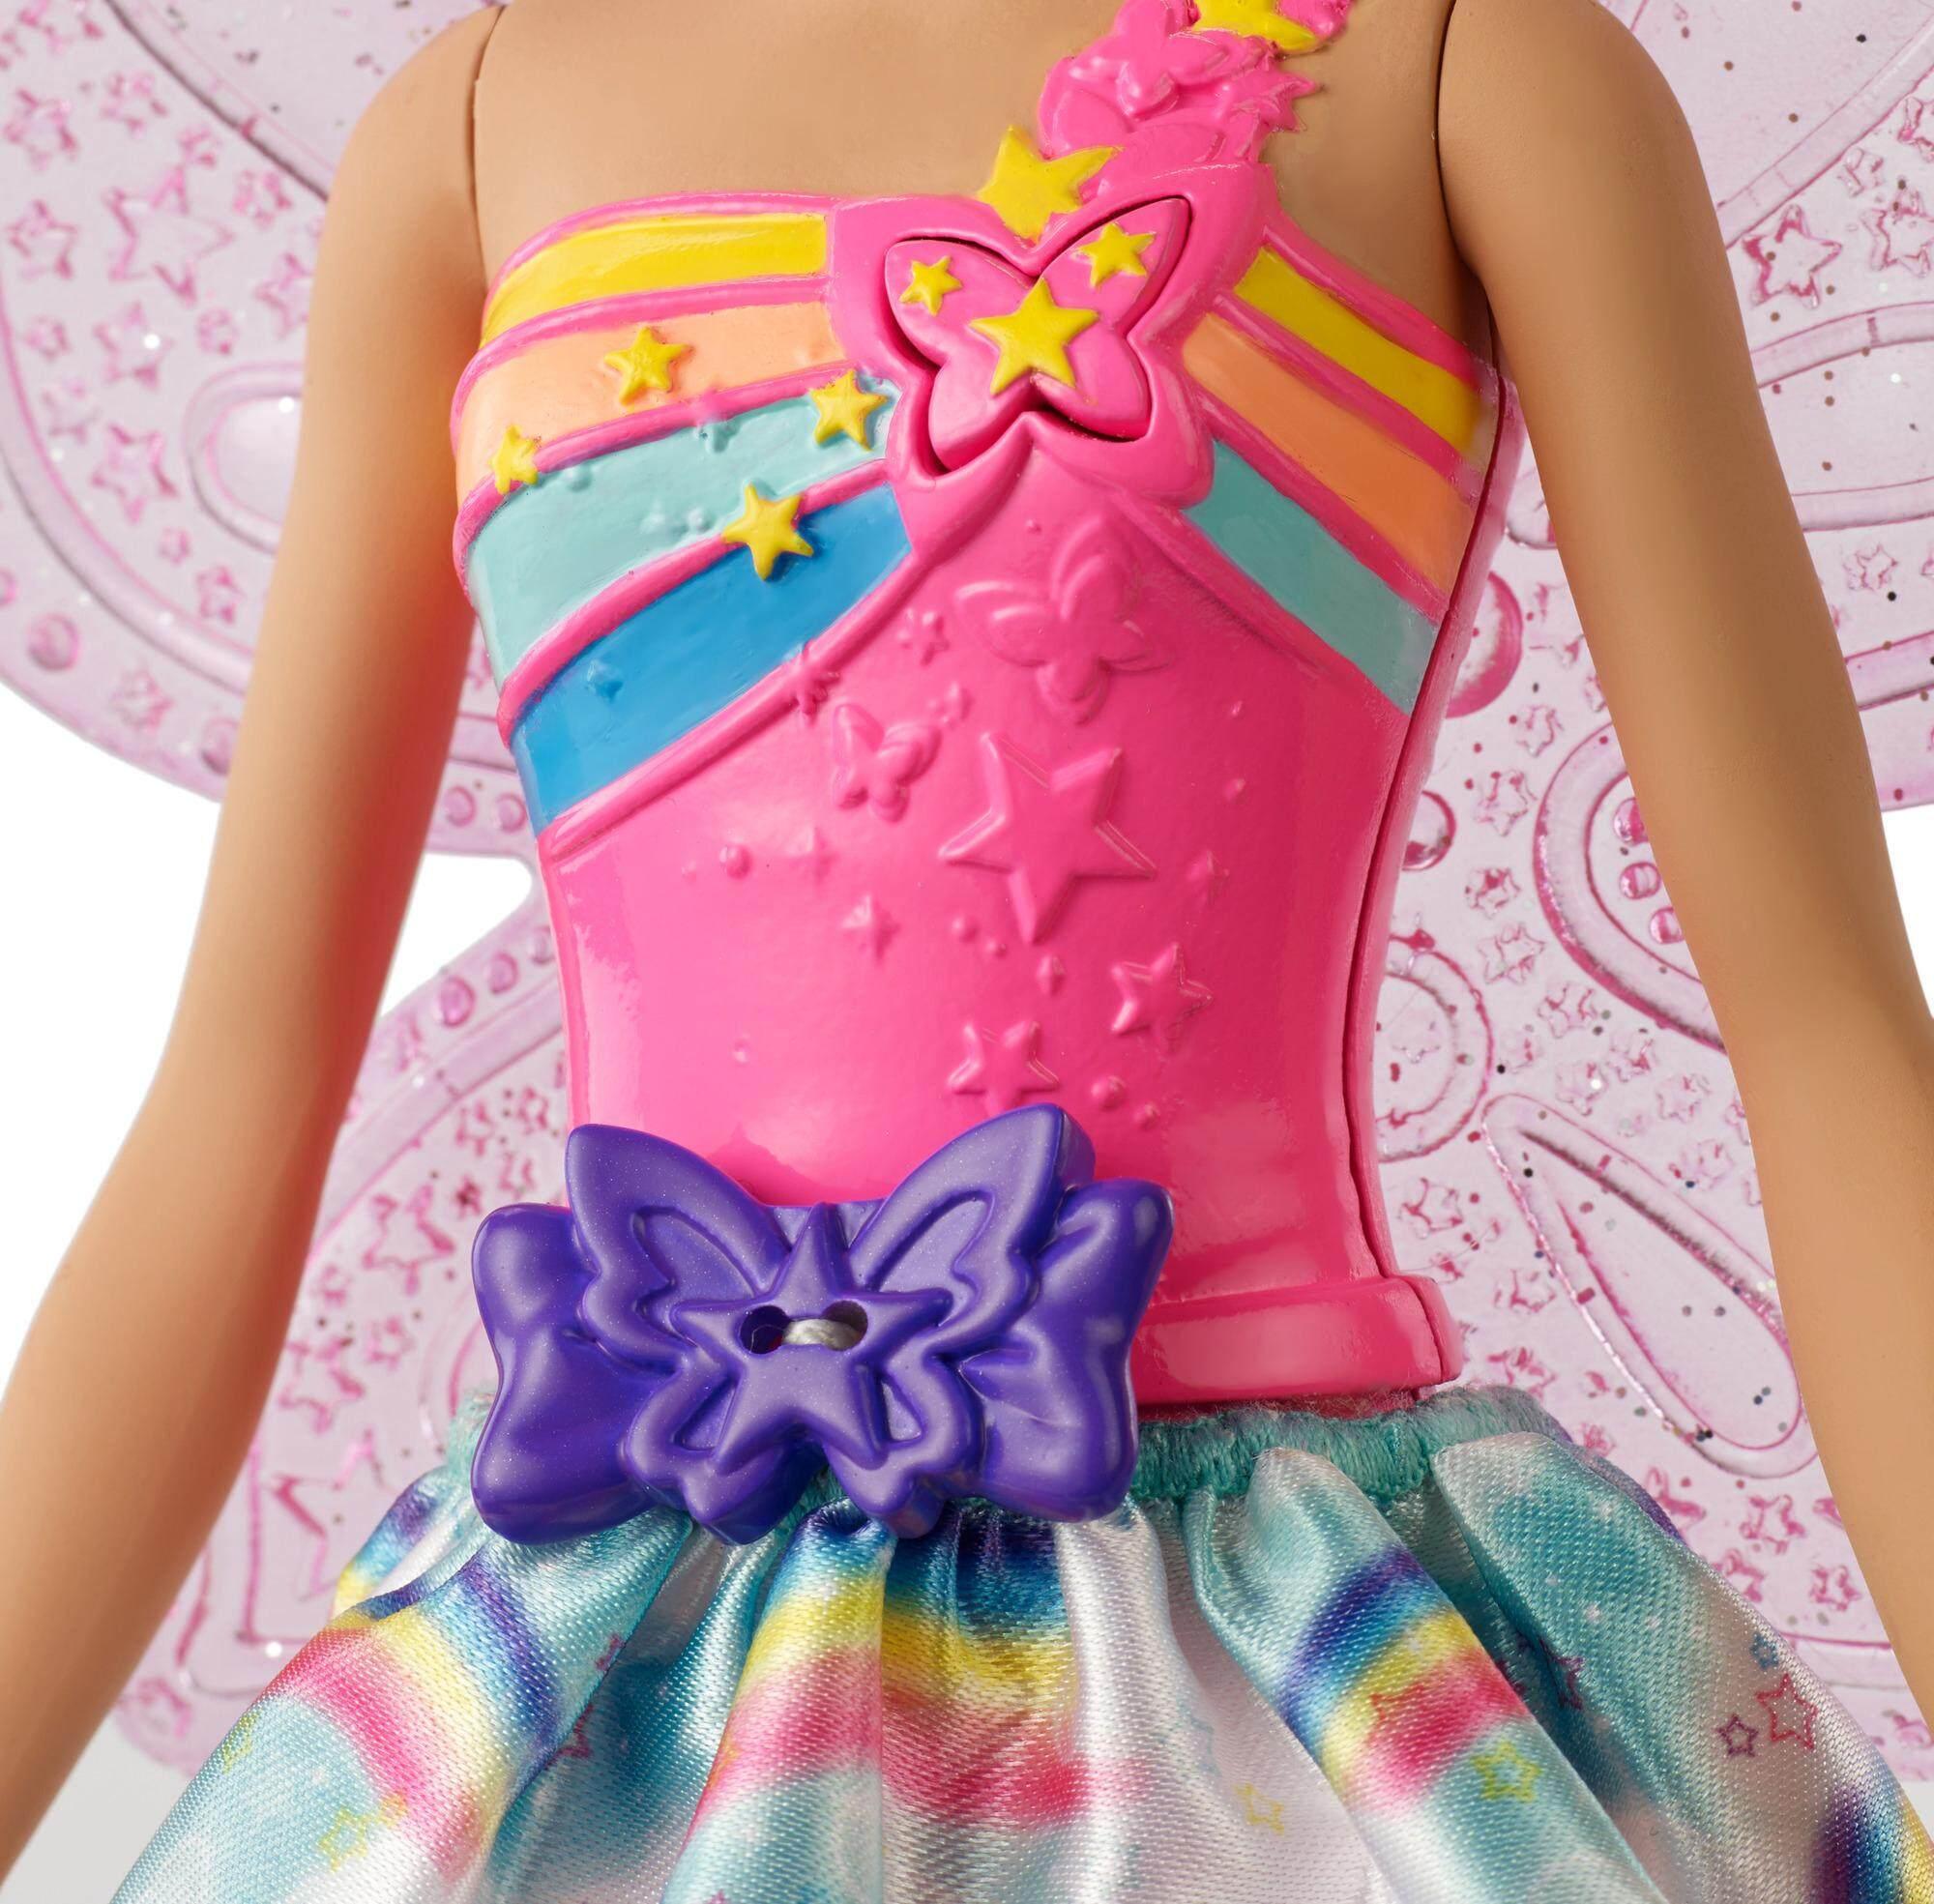 [BARBIE] Dreamtopia Flying Wings Fairy Doll (3 yrs+)